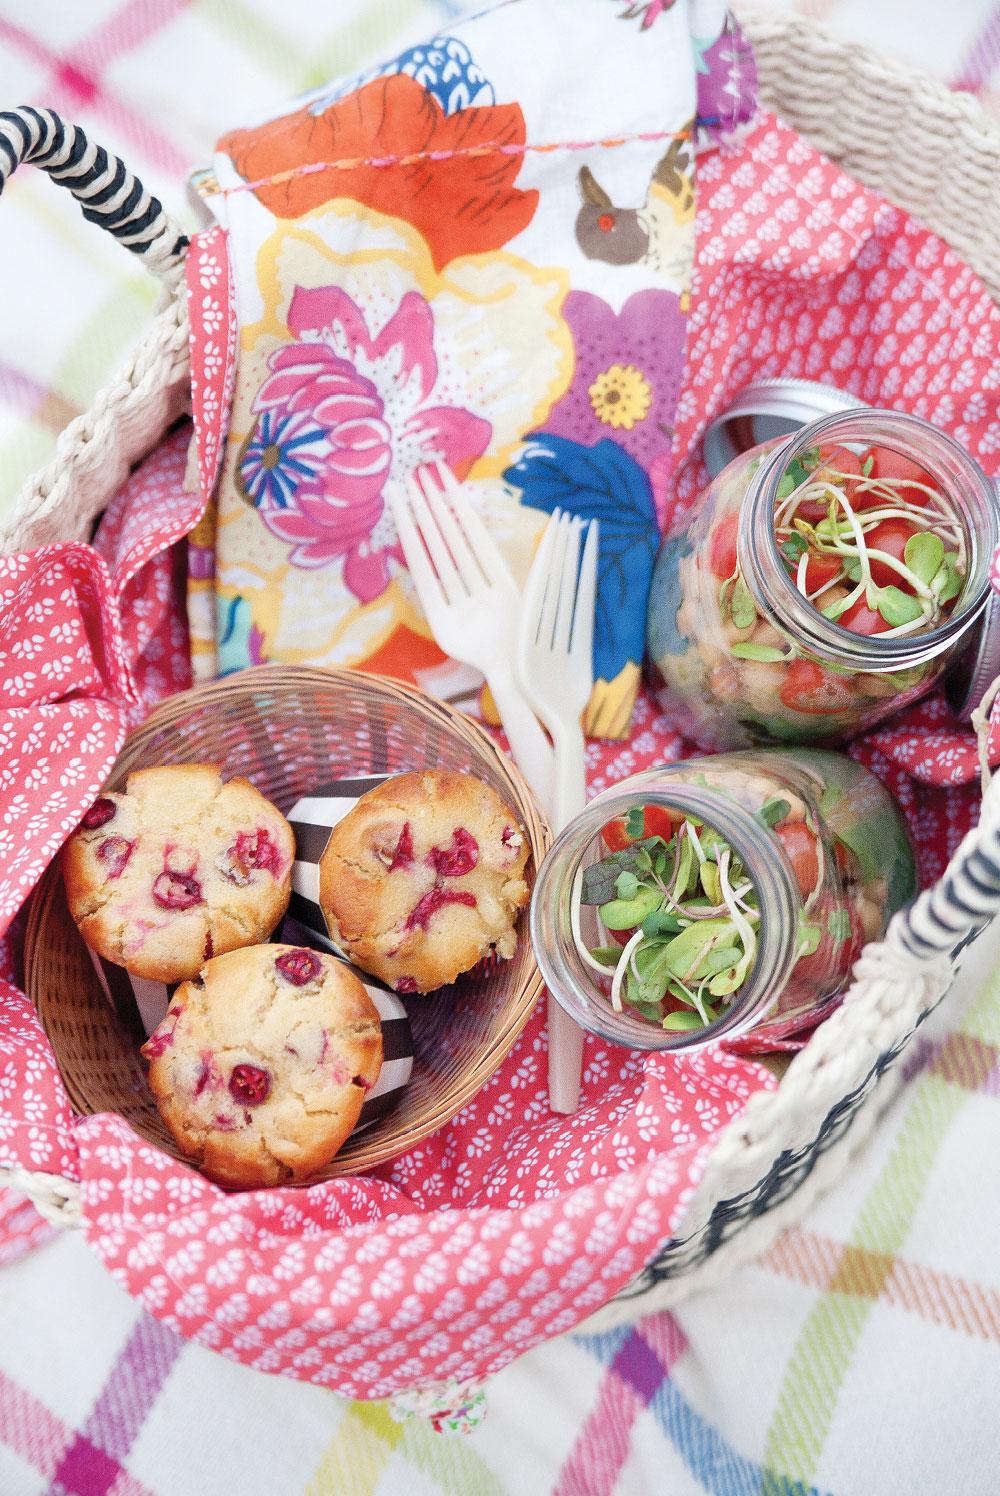 Gluten-Free-Vegan-Cranberry-Lemon-Muffins-Pure-Ella-Leche7